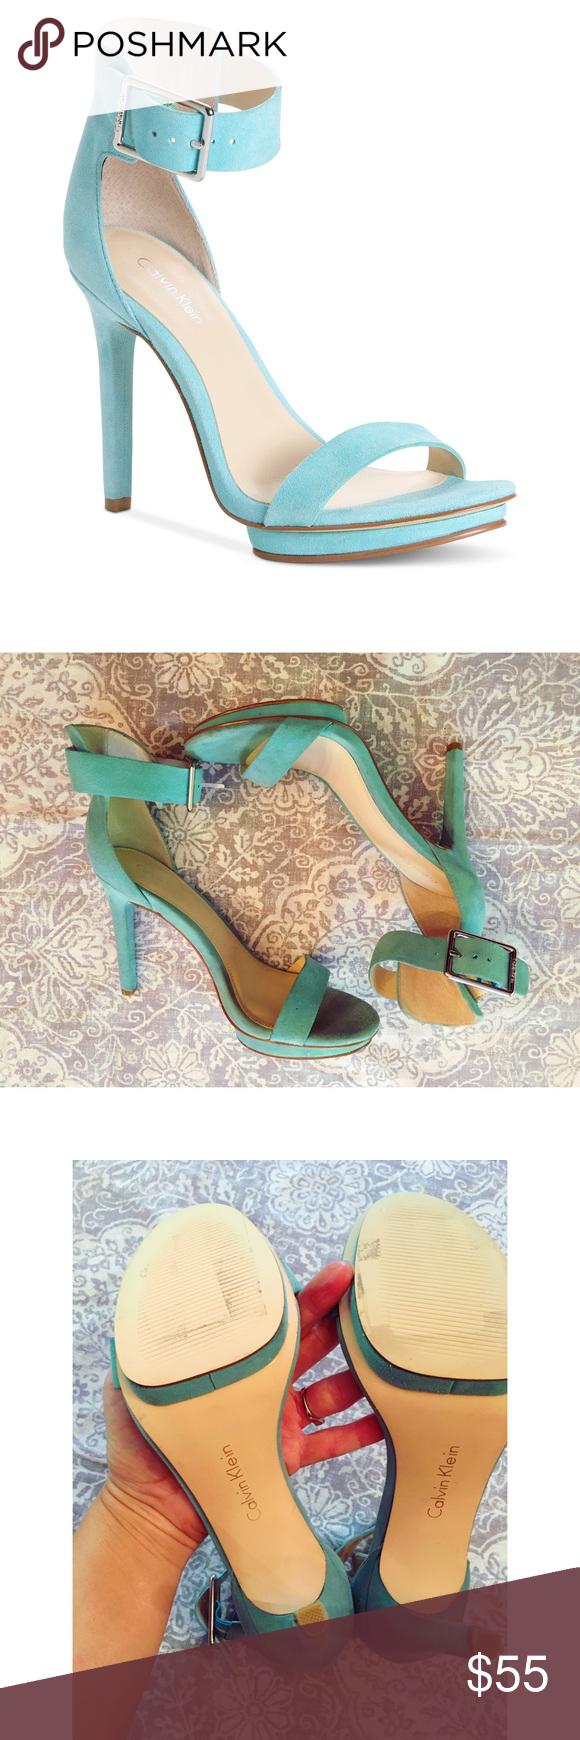 39599c57b72 Calvin Klein Vivian sandal Beautiful teal Calvin Klein Vivian suede sandal.  Leather upper  man